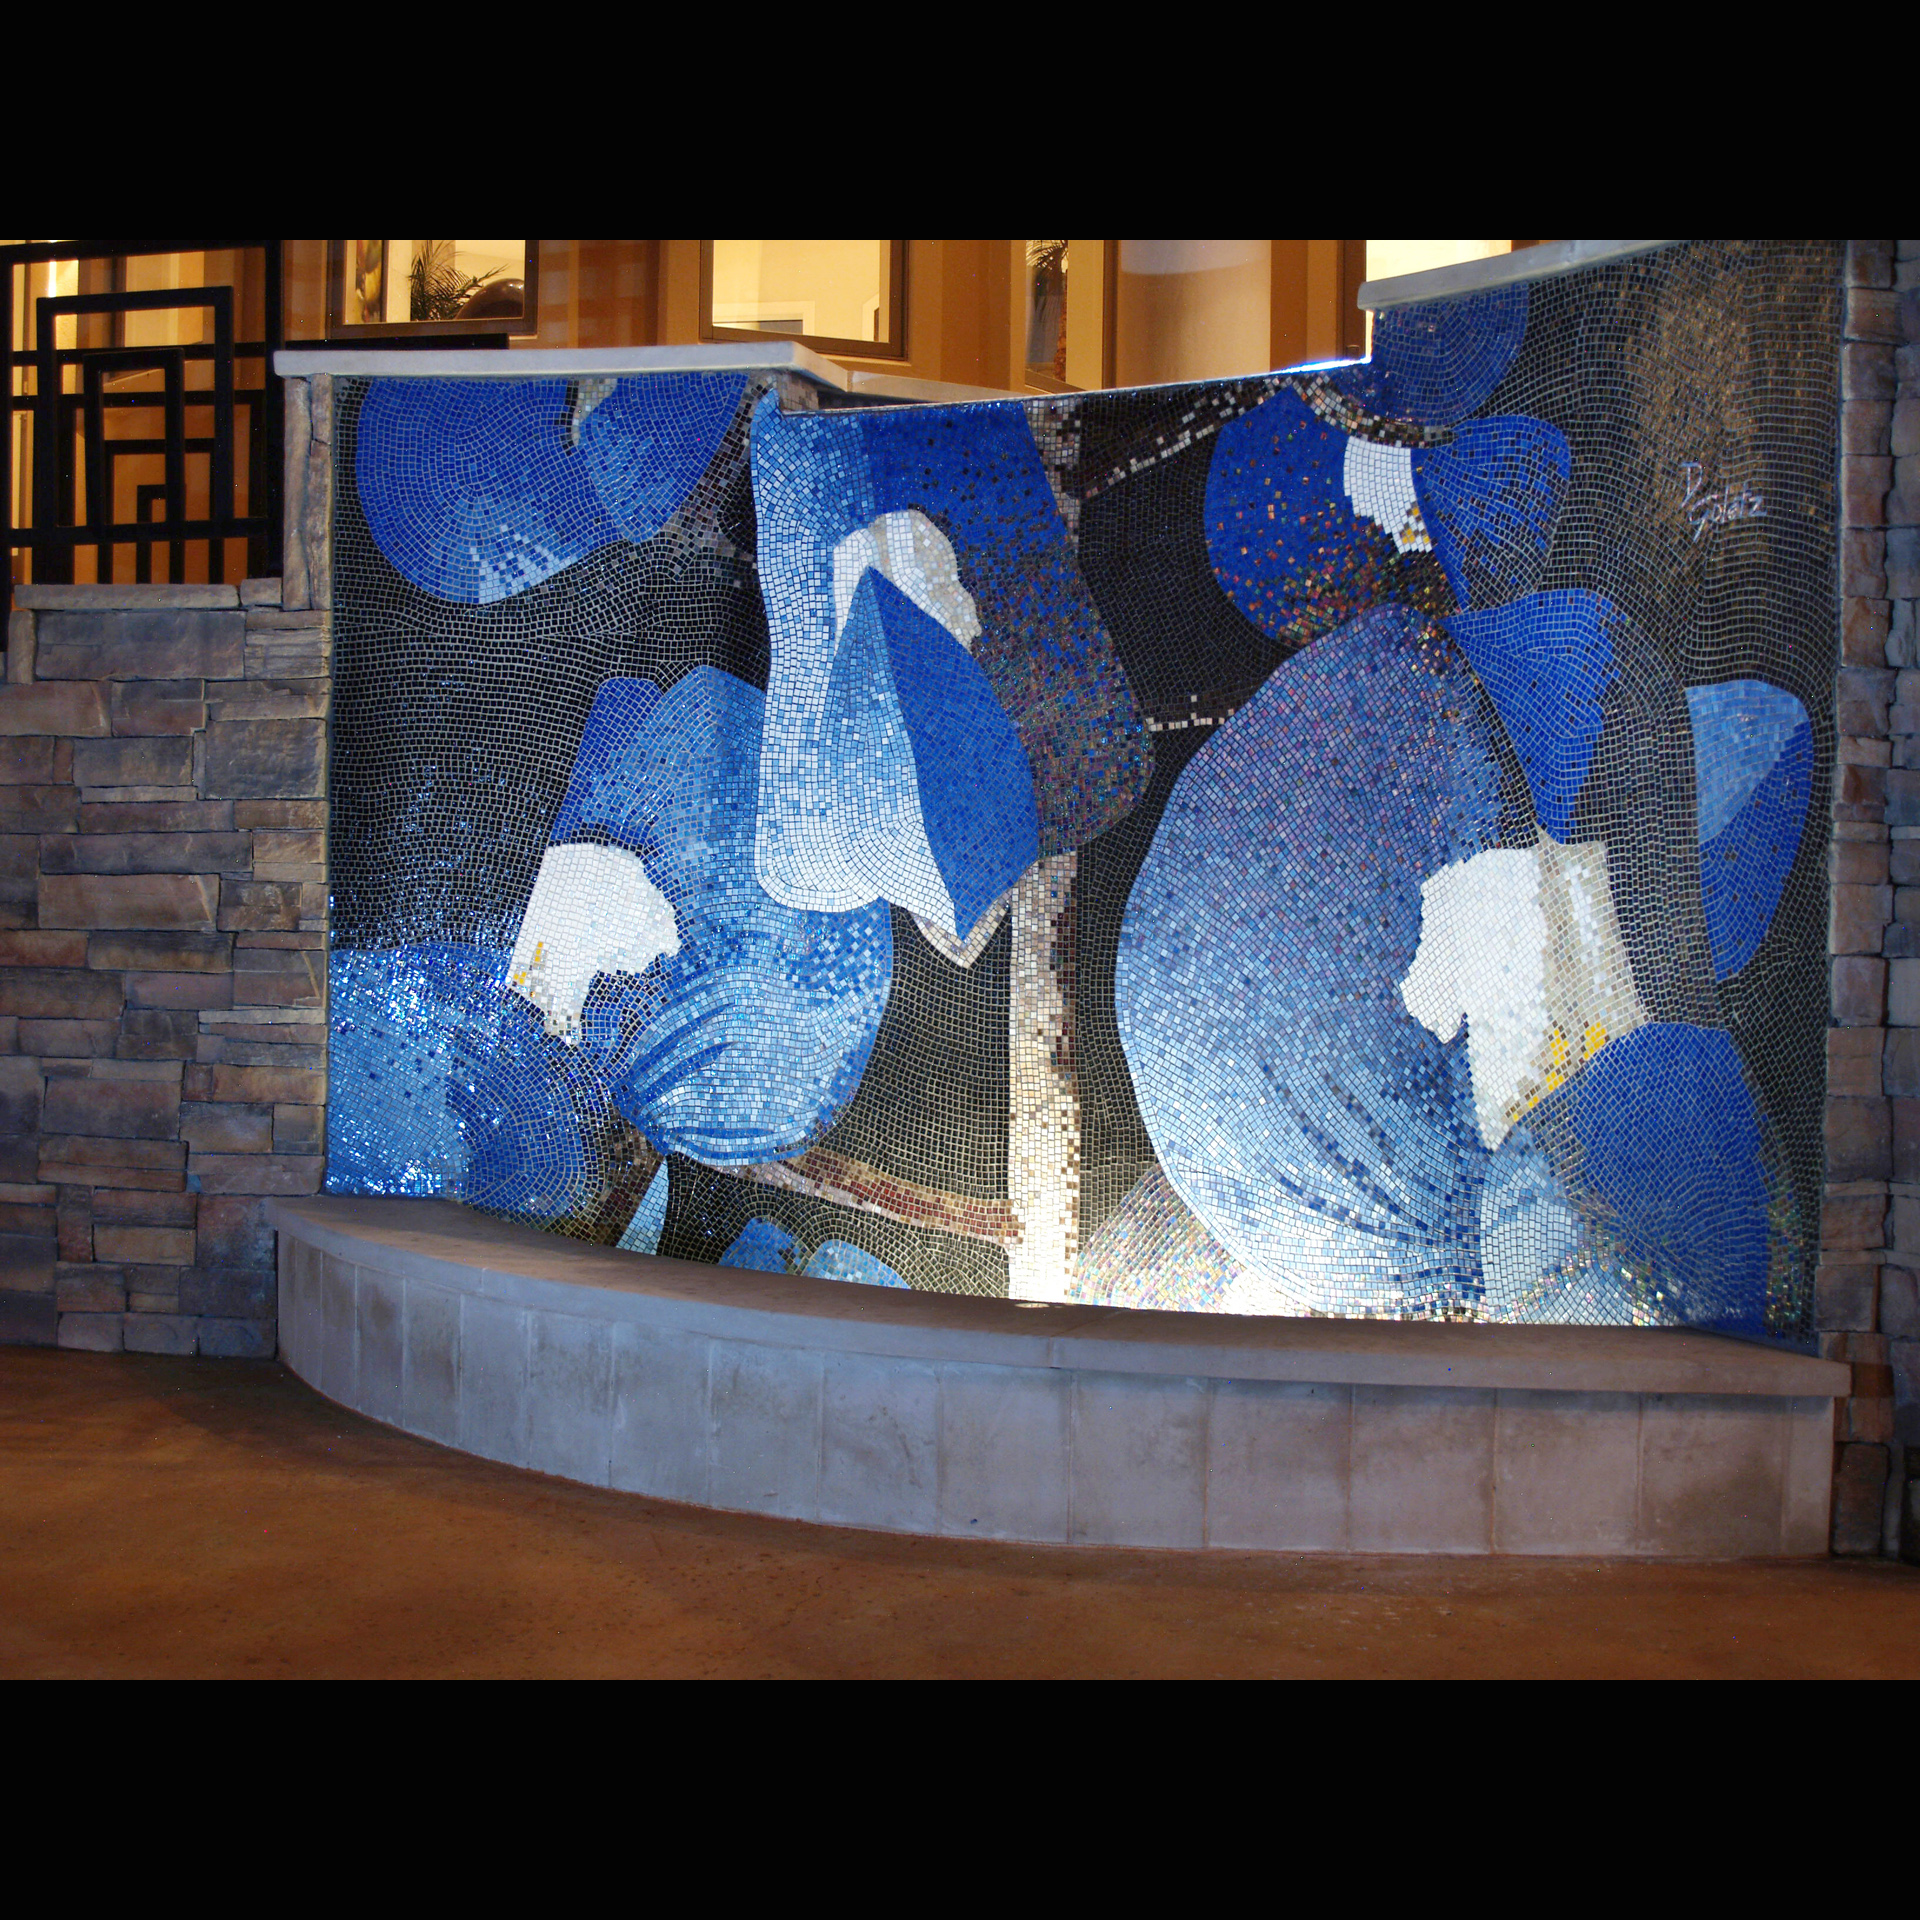 Texas Bluebonnet Fountain